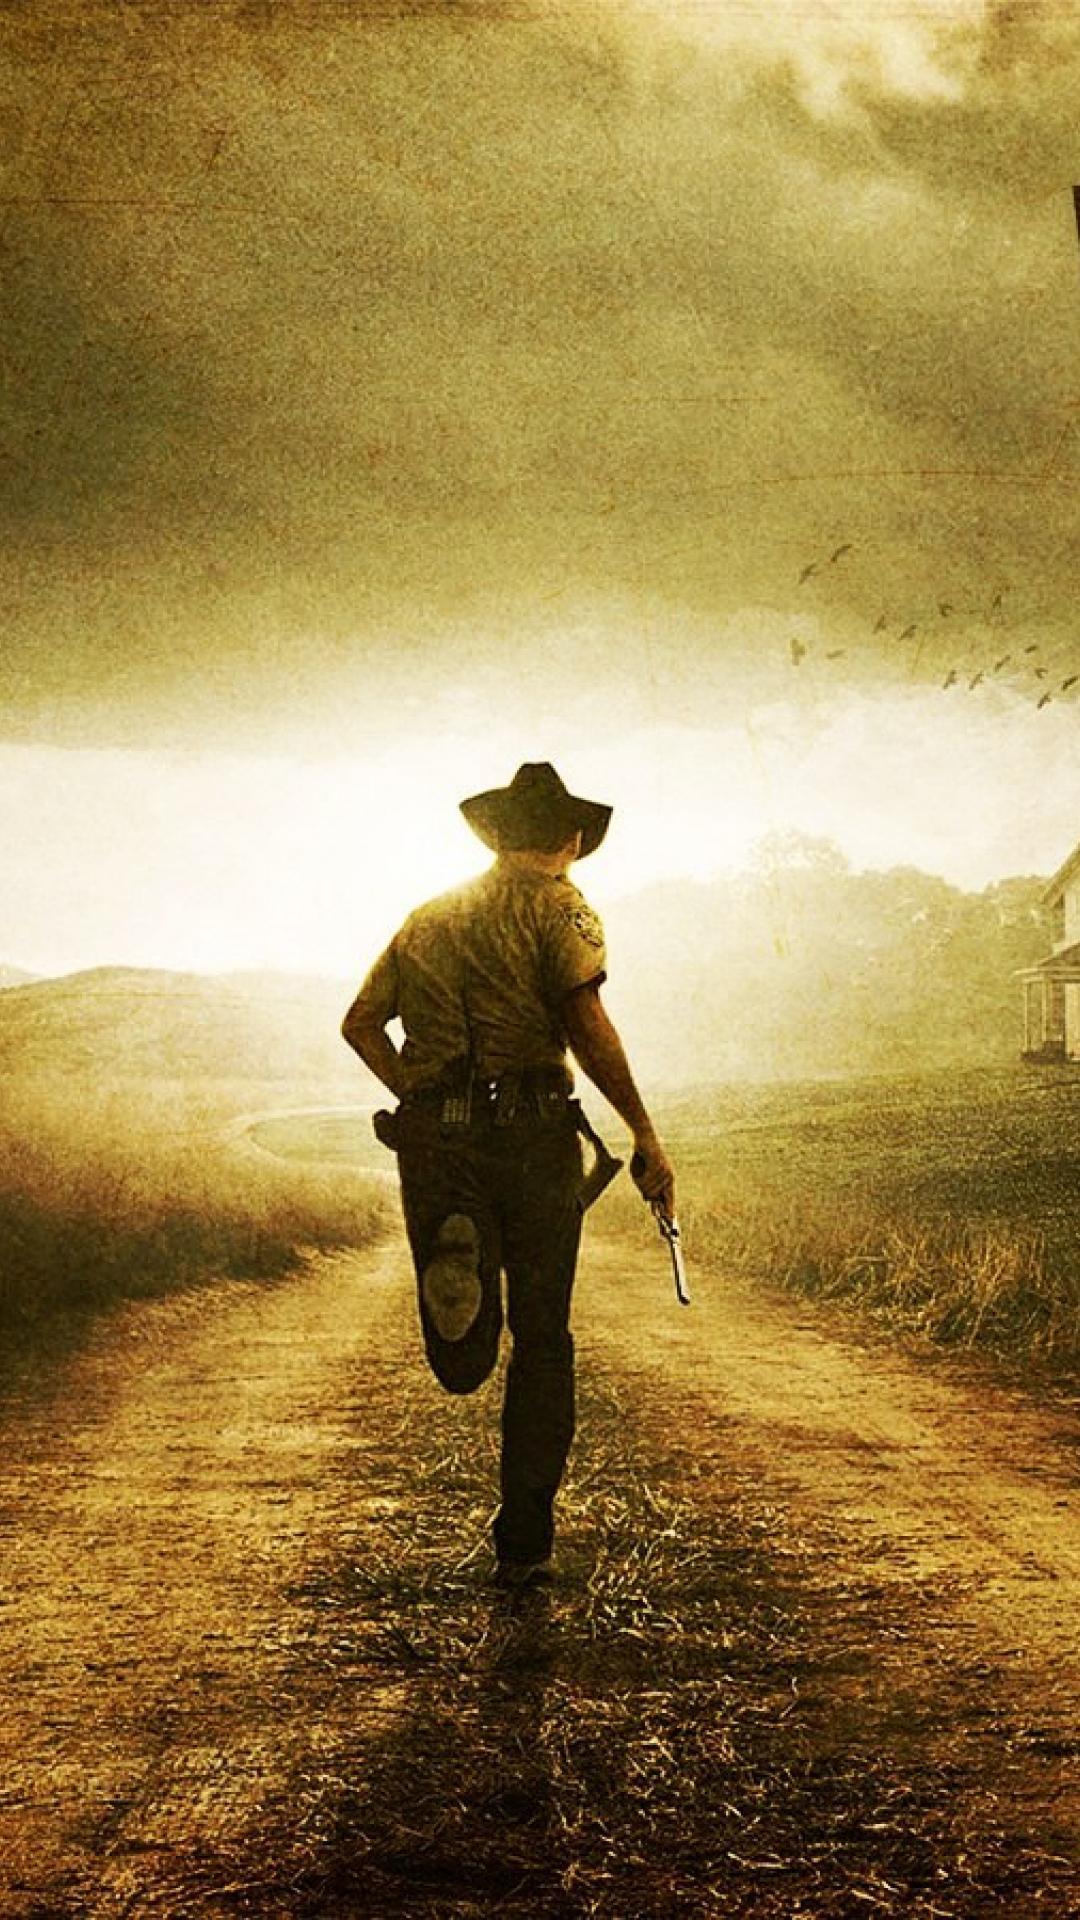 46 Walking Dead Iphone Wallpaper On Wallpapersafari